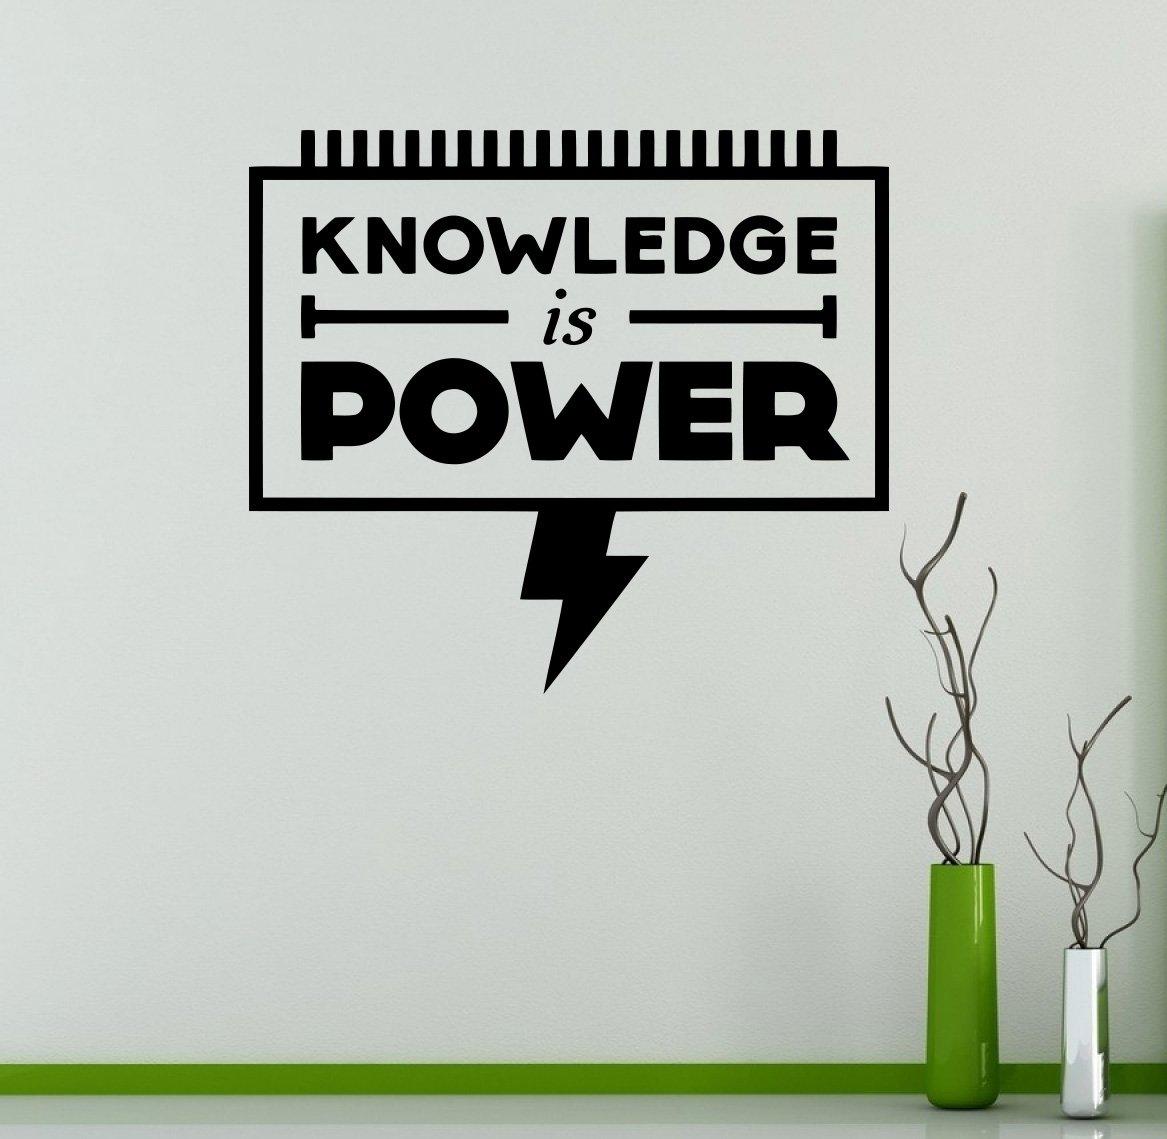 Knowledge is power wall decal motivational quotes vinyl sticker inspiration home interior room decor custom decals 18mot amazon com